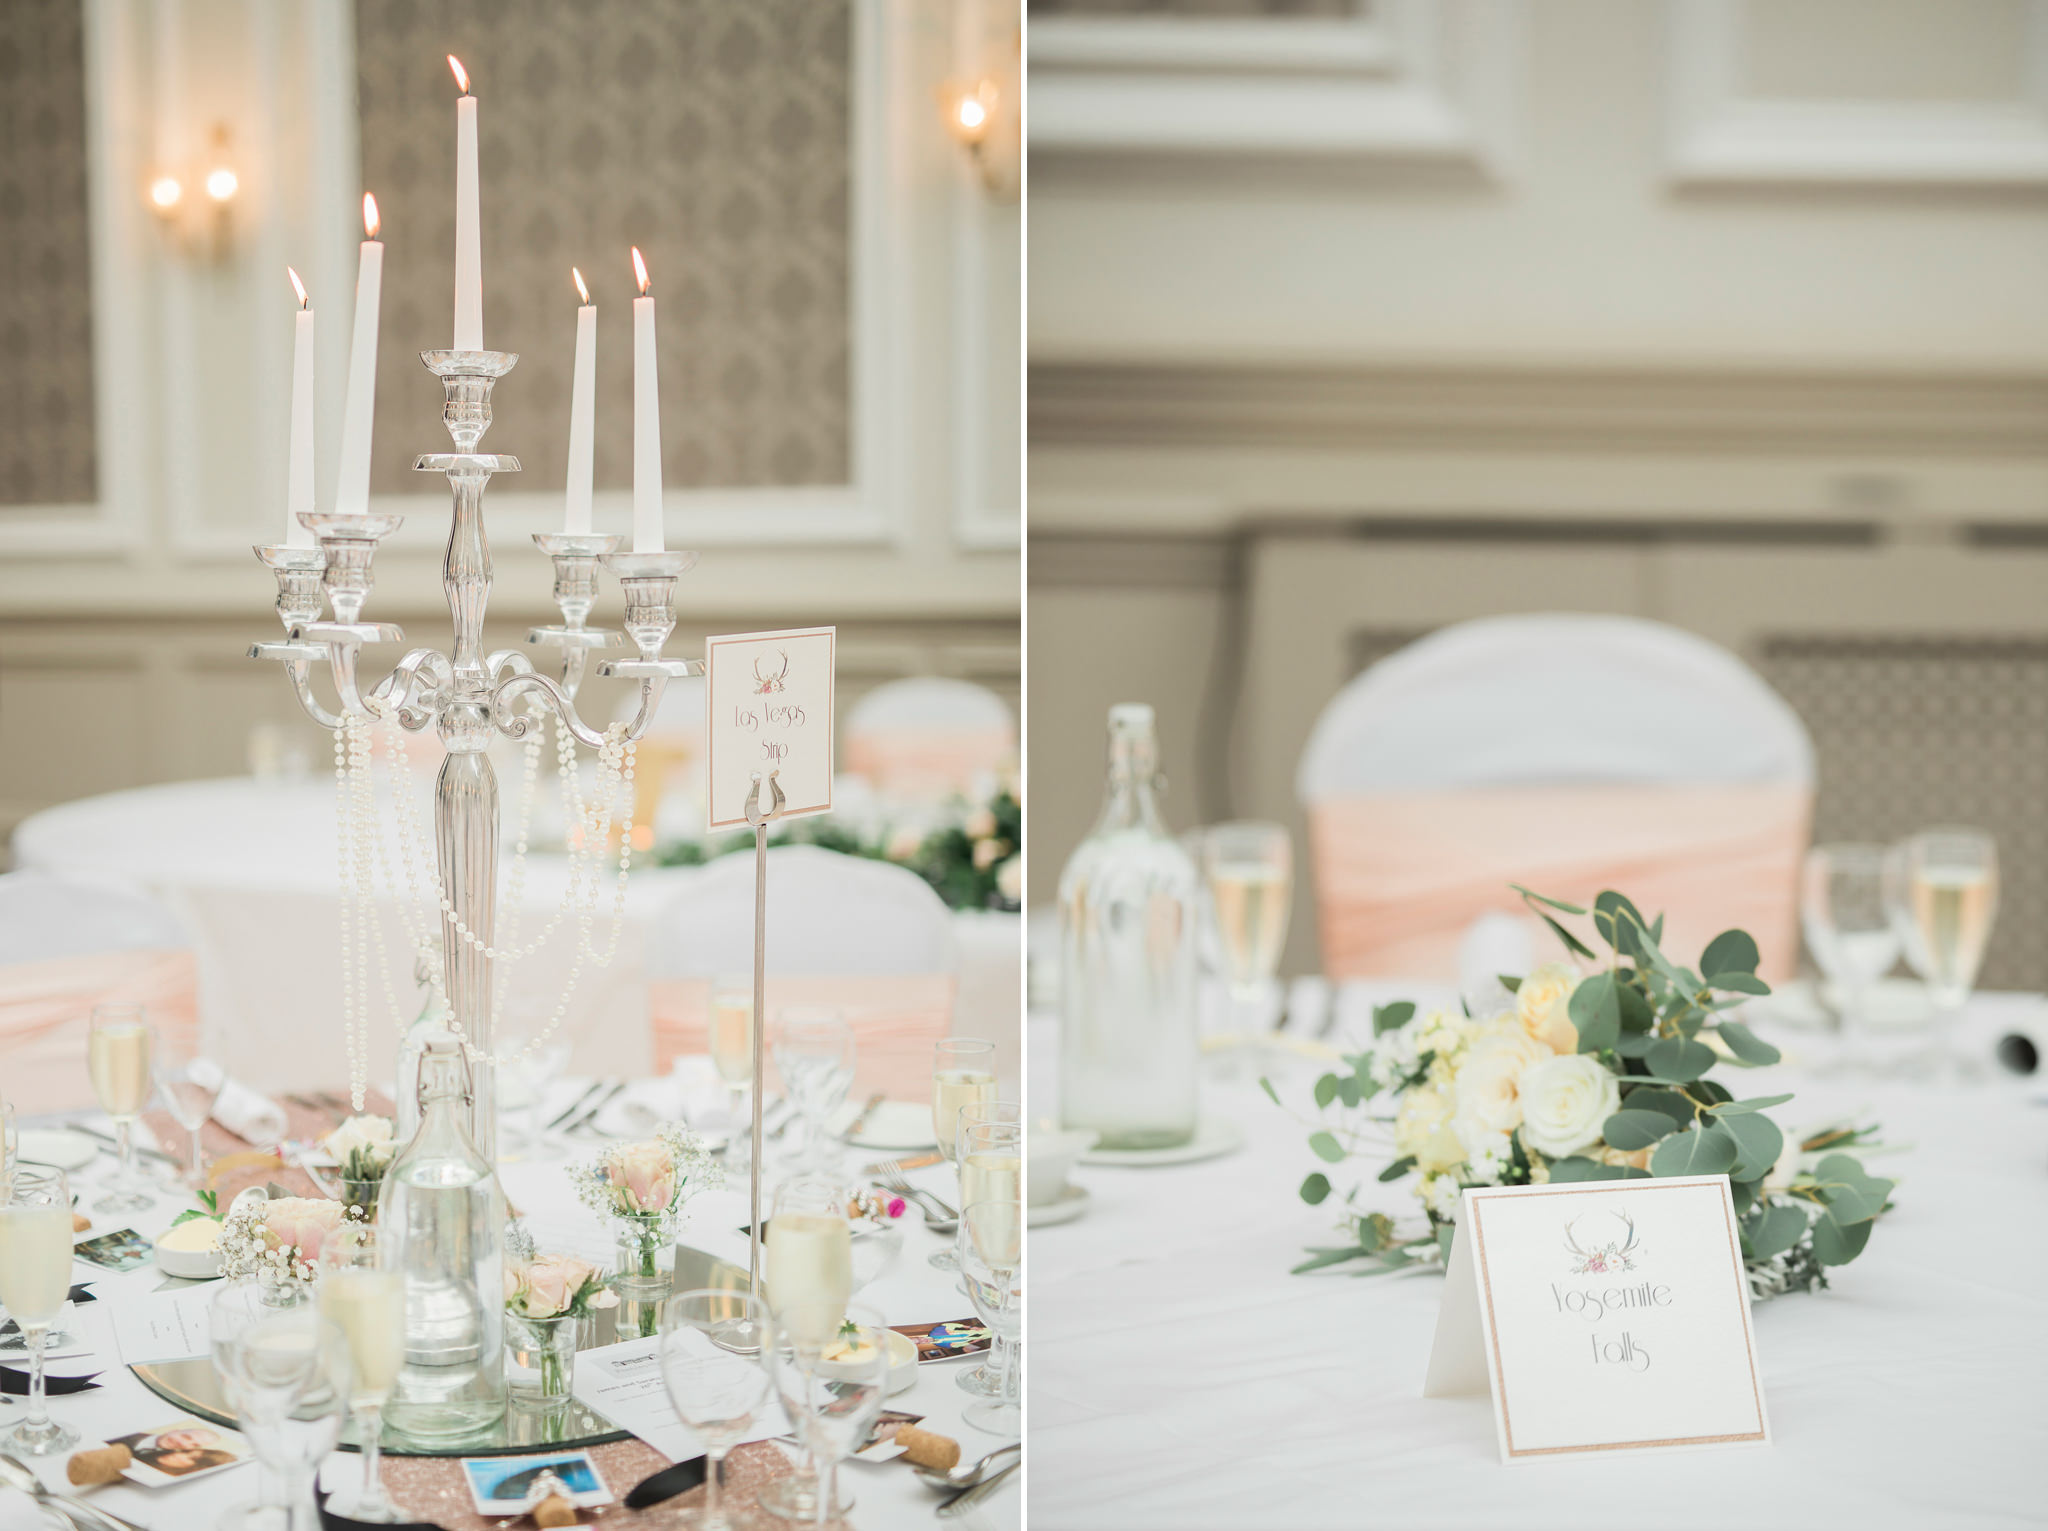 099-desination-wedding-photographer-scotland.jpg